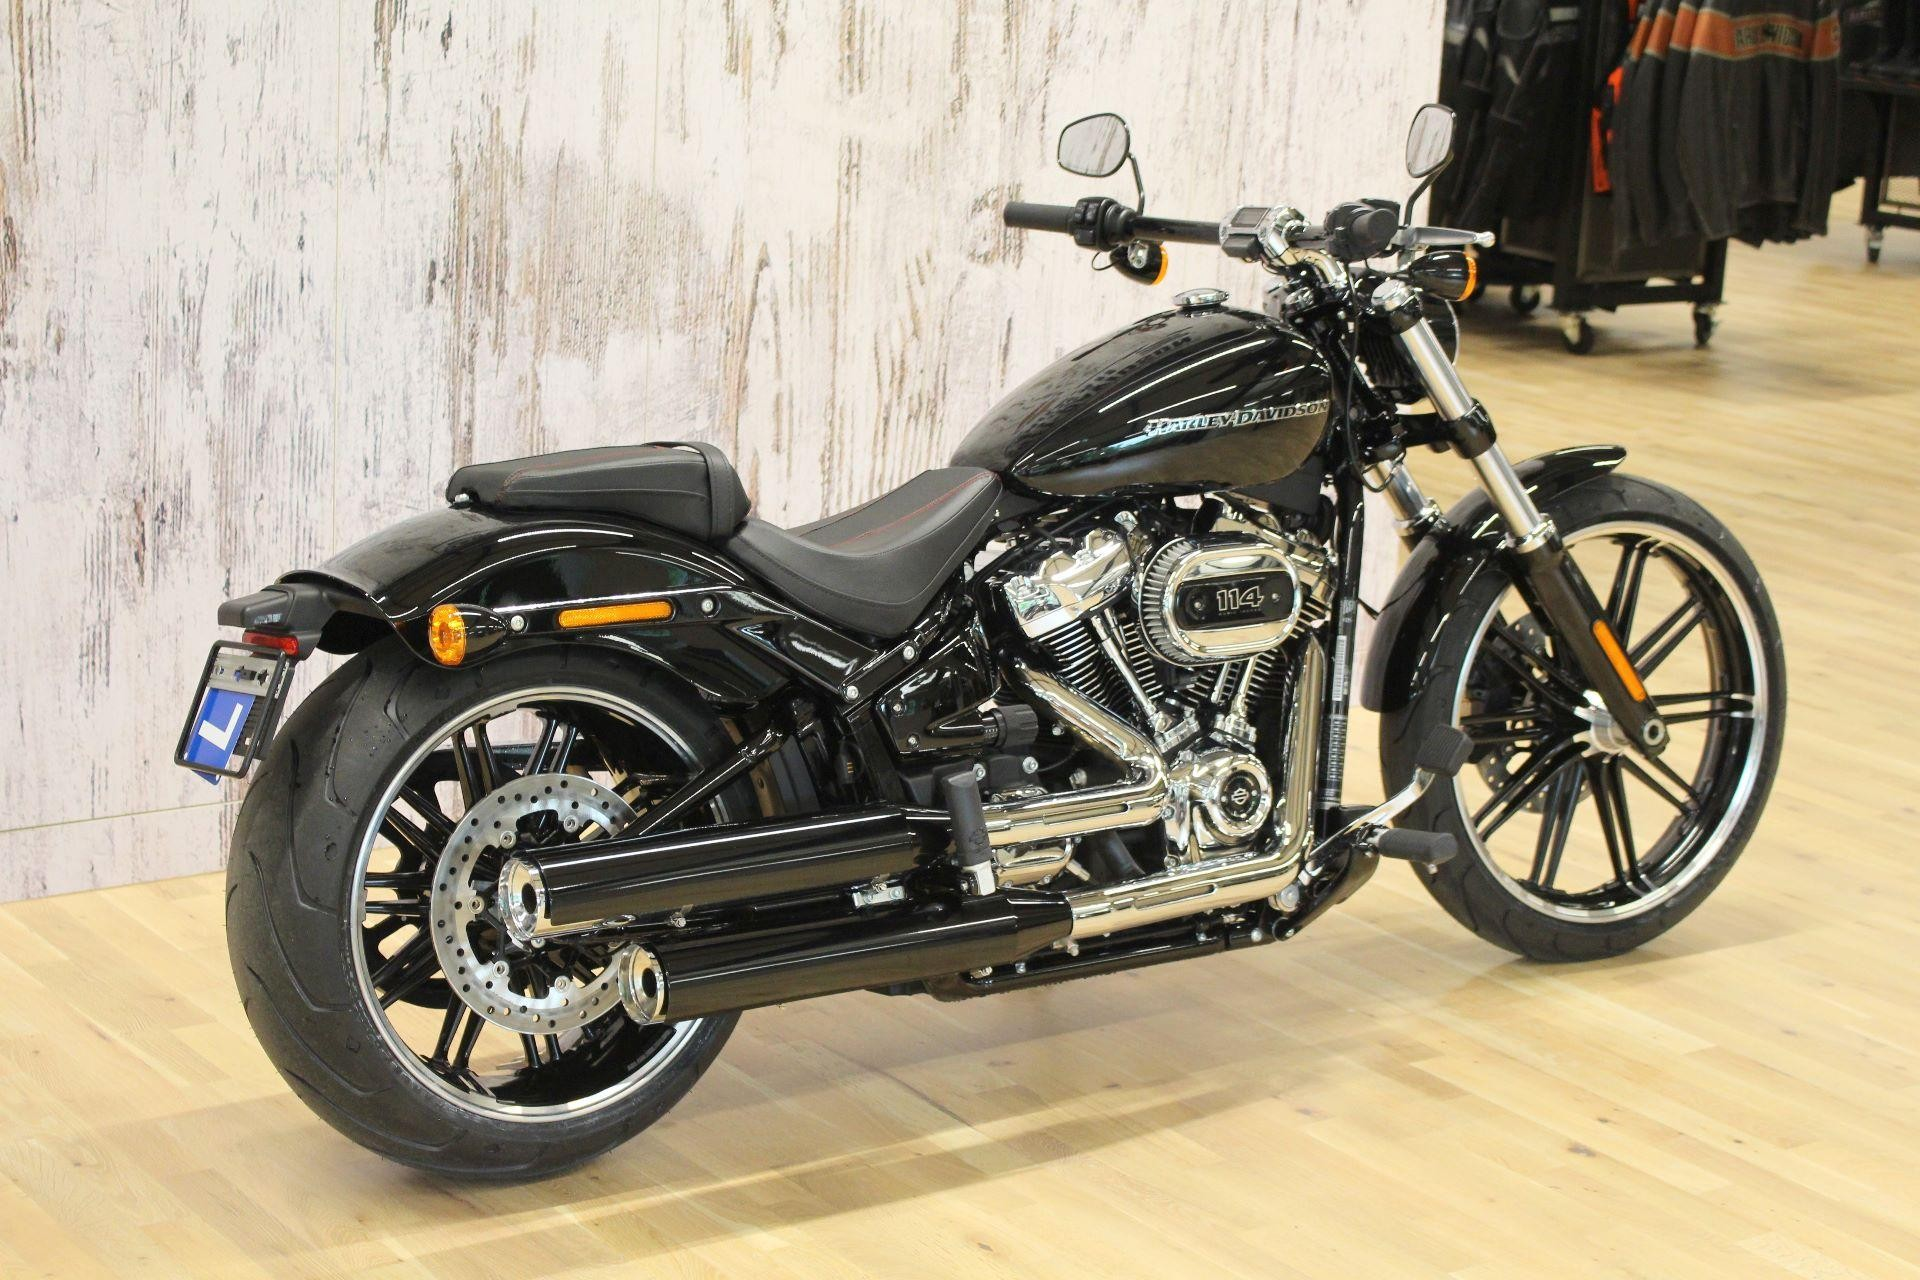 HARLEY-DAVIDSON FXBRS 1868 BREAKOUT 114 Model 2018 Harley ...